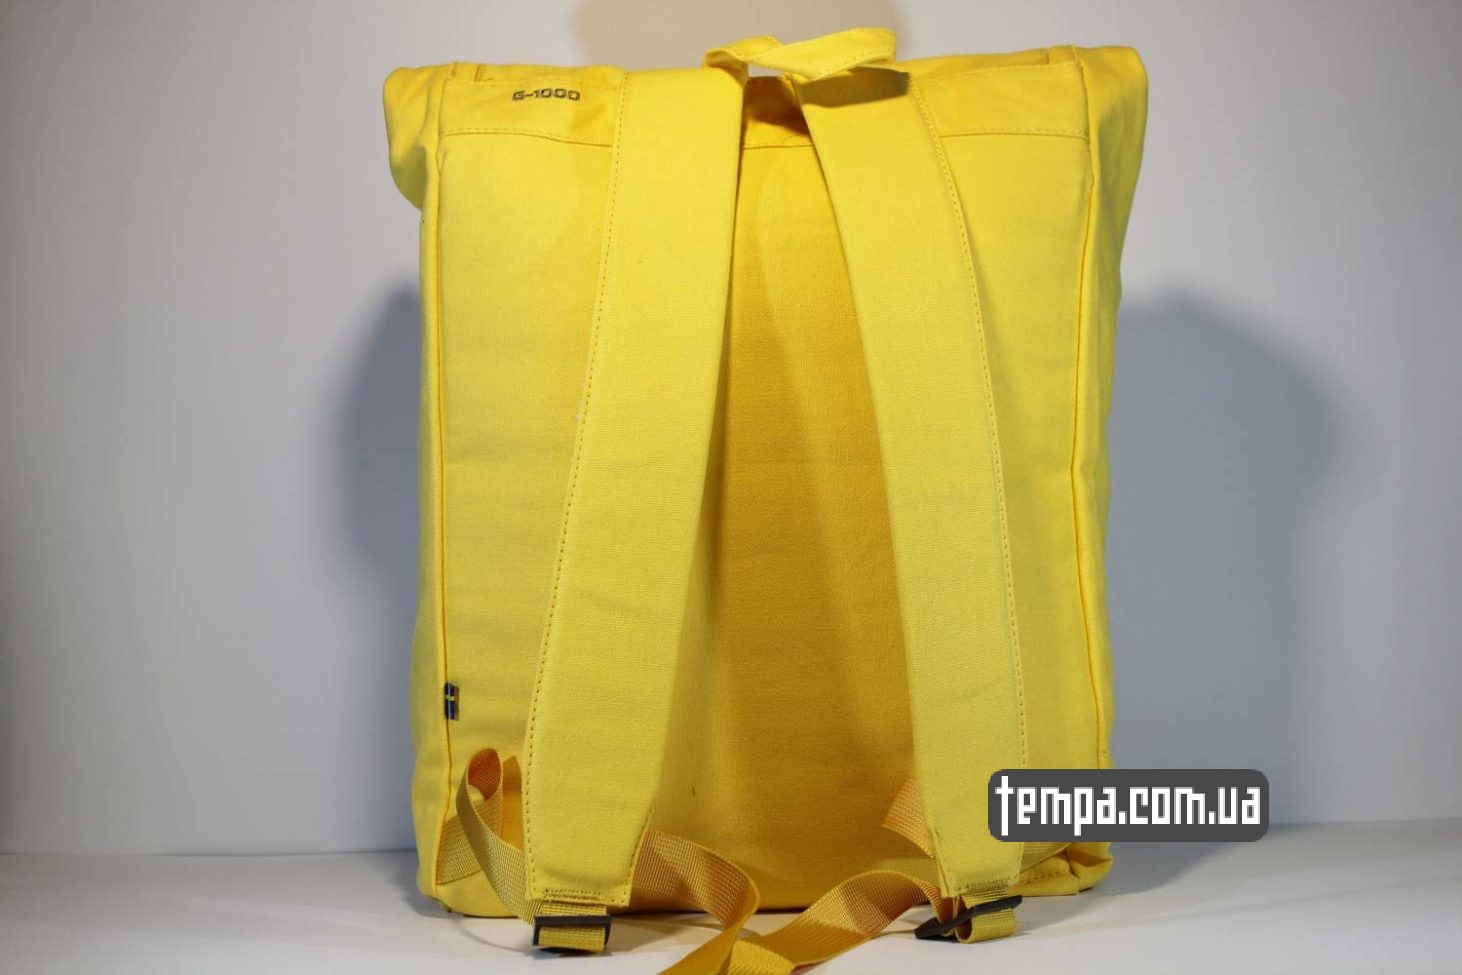 рюкзак сумка G-1000 FOLDSACK NO.1 fjallraven kanken желтый